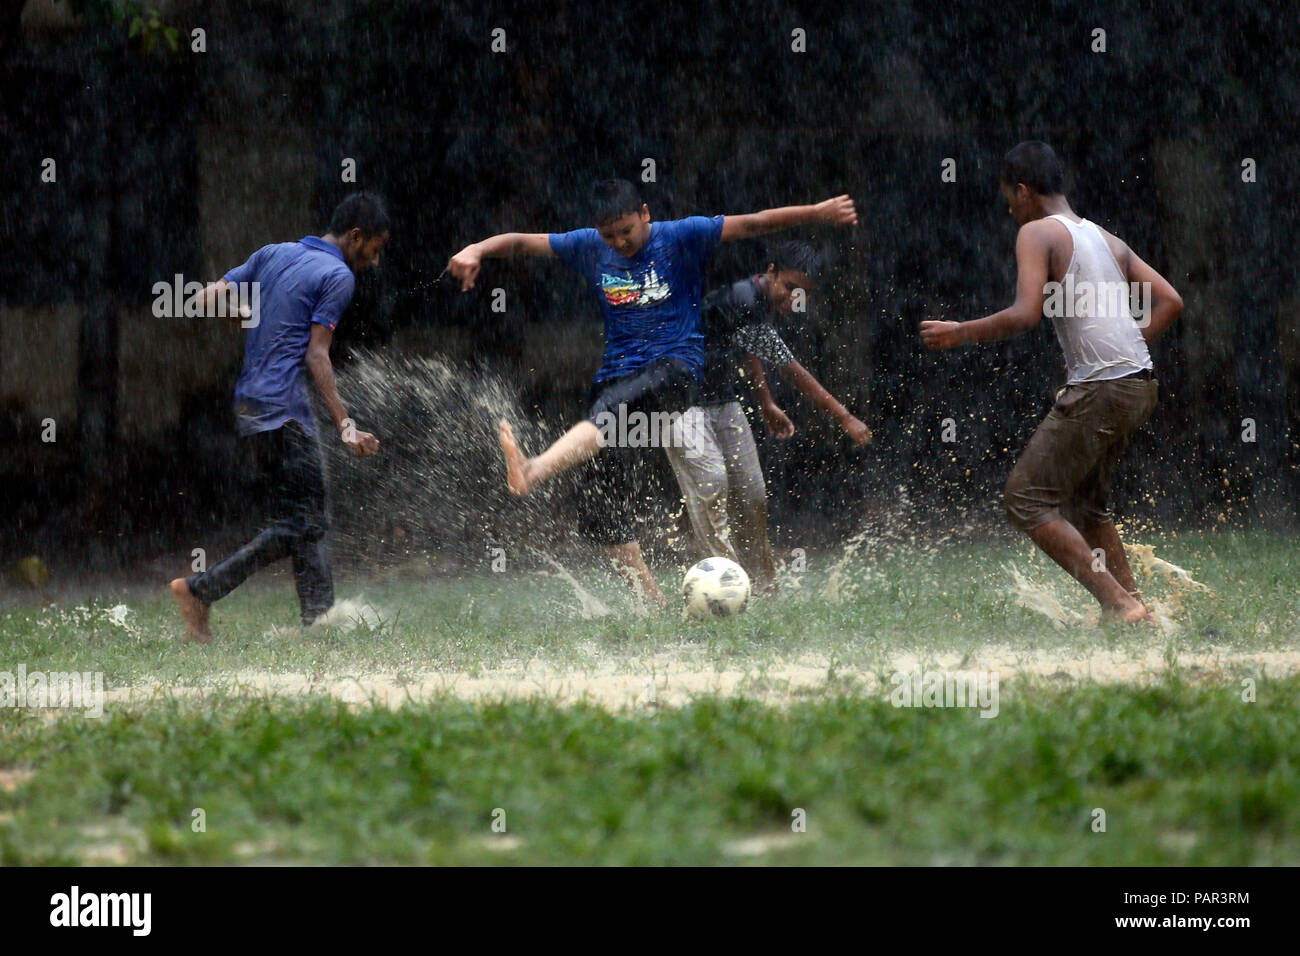 The fiver Continuing:  Jubilates enjoy soccer during rain at Bangabhaban Govt. Primary School ground in The Capital, Dhaka, Bangladesh. July 23, 2018 - Stock Image